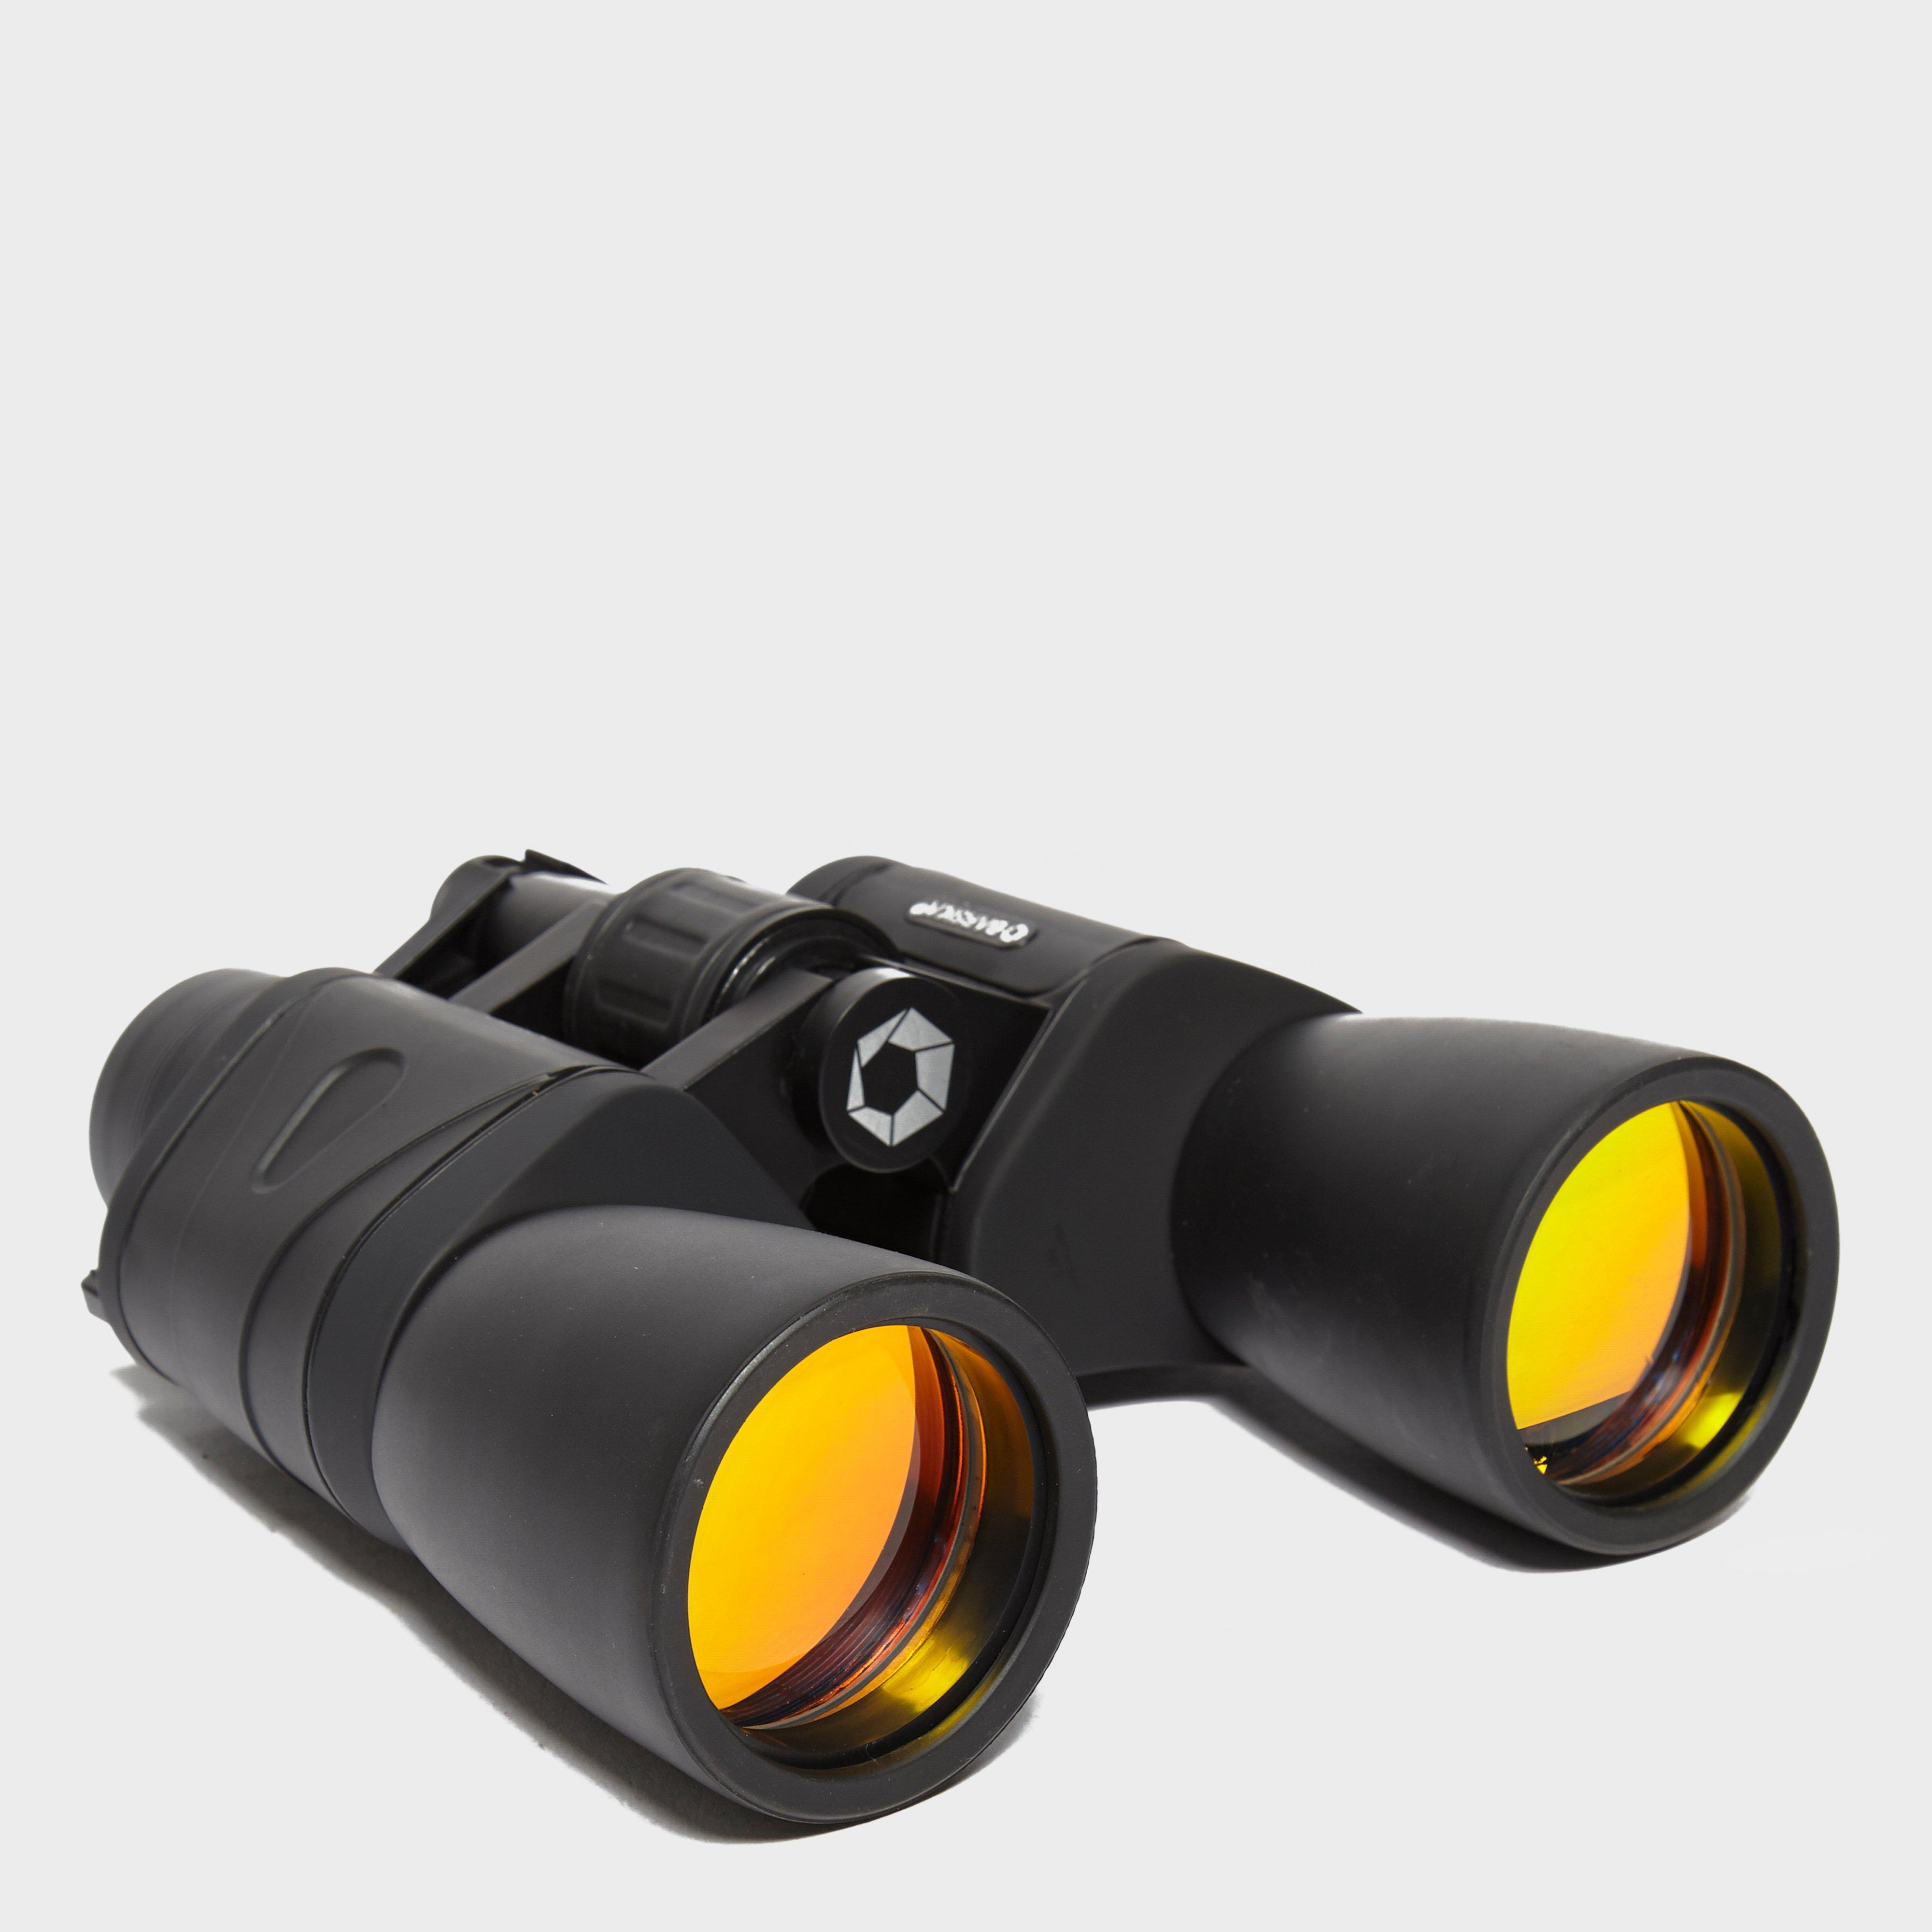 Barska Gladiator Zoom Binoculars 1-30 X 50mm - Black/10-30x50  Black/10-30x50